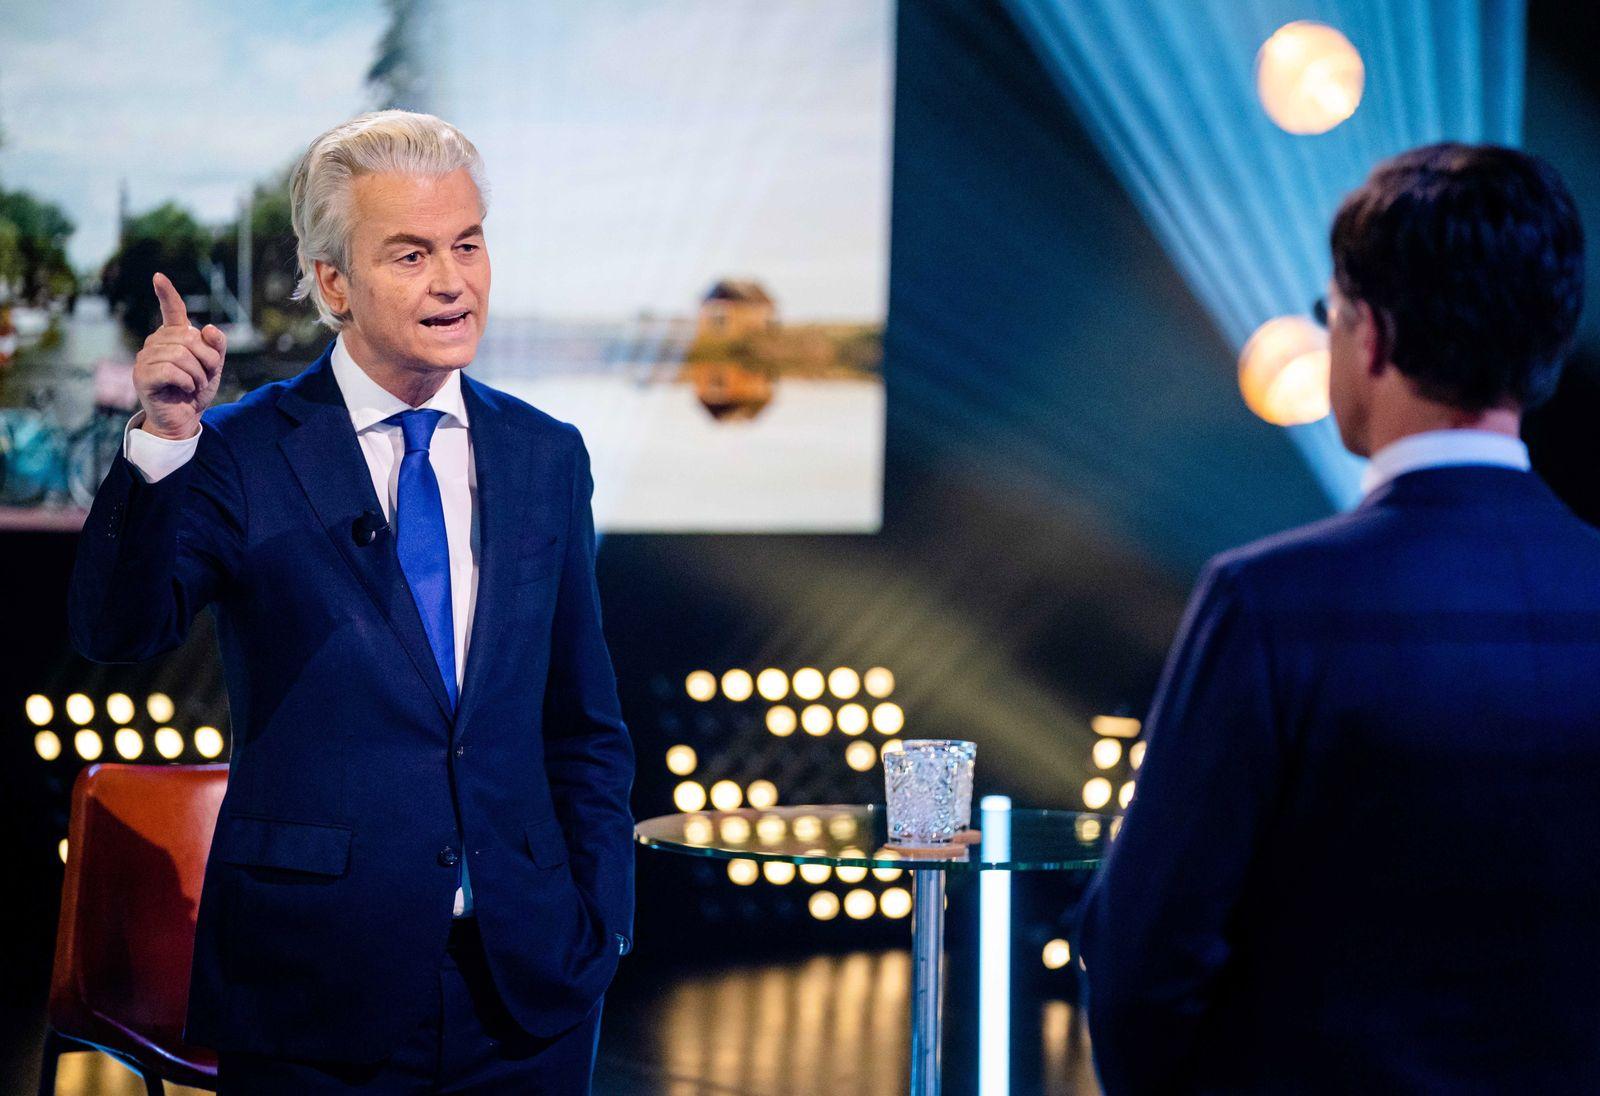 Geert Wilders and Mark Rutte in election debate